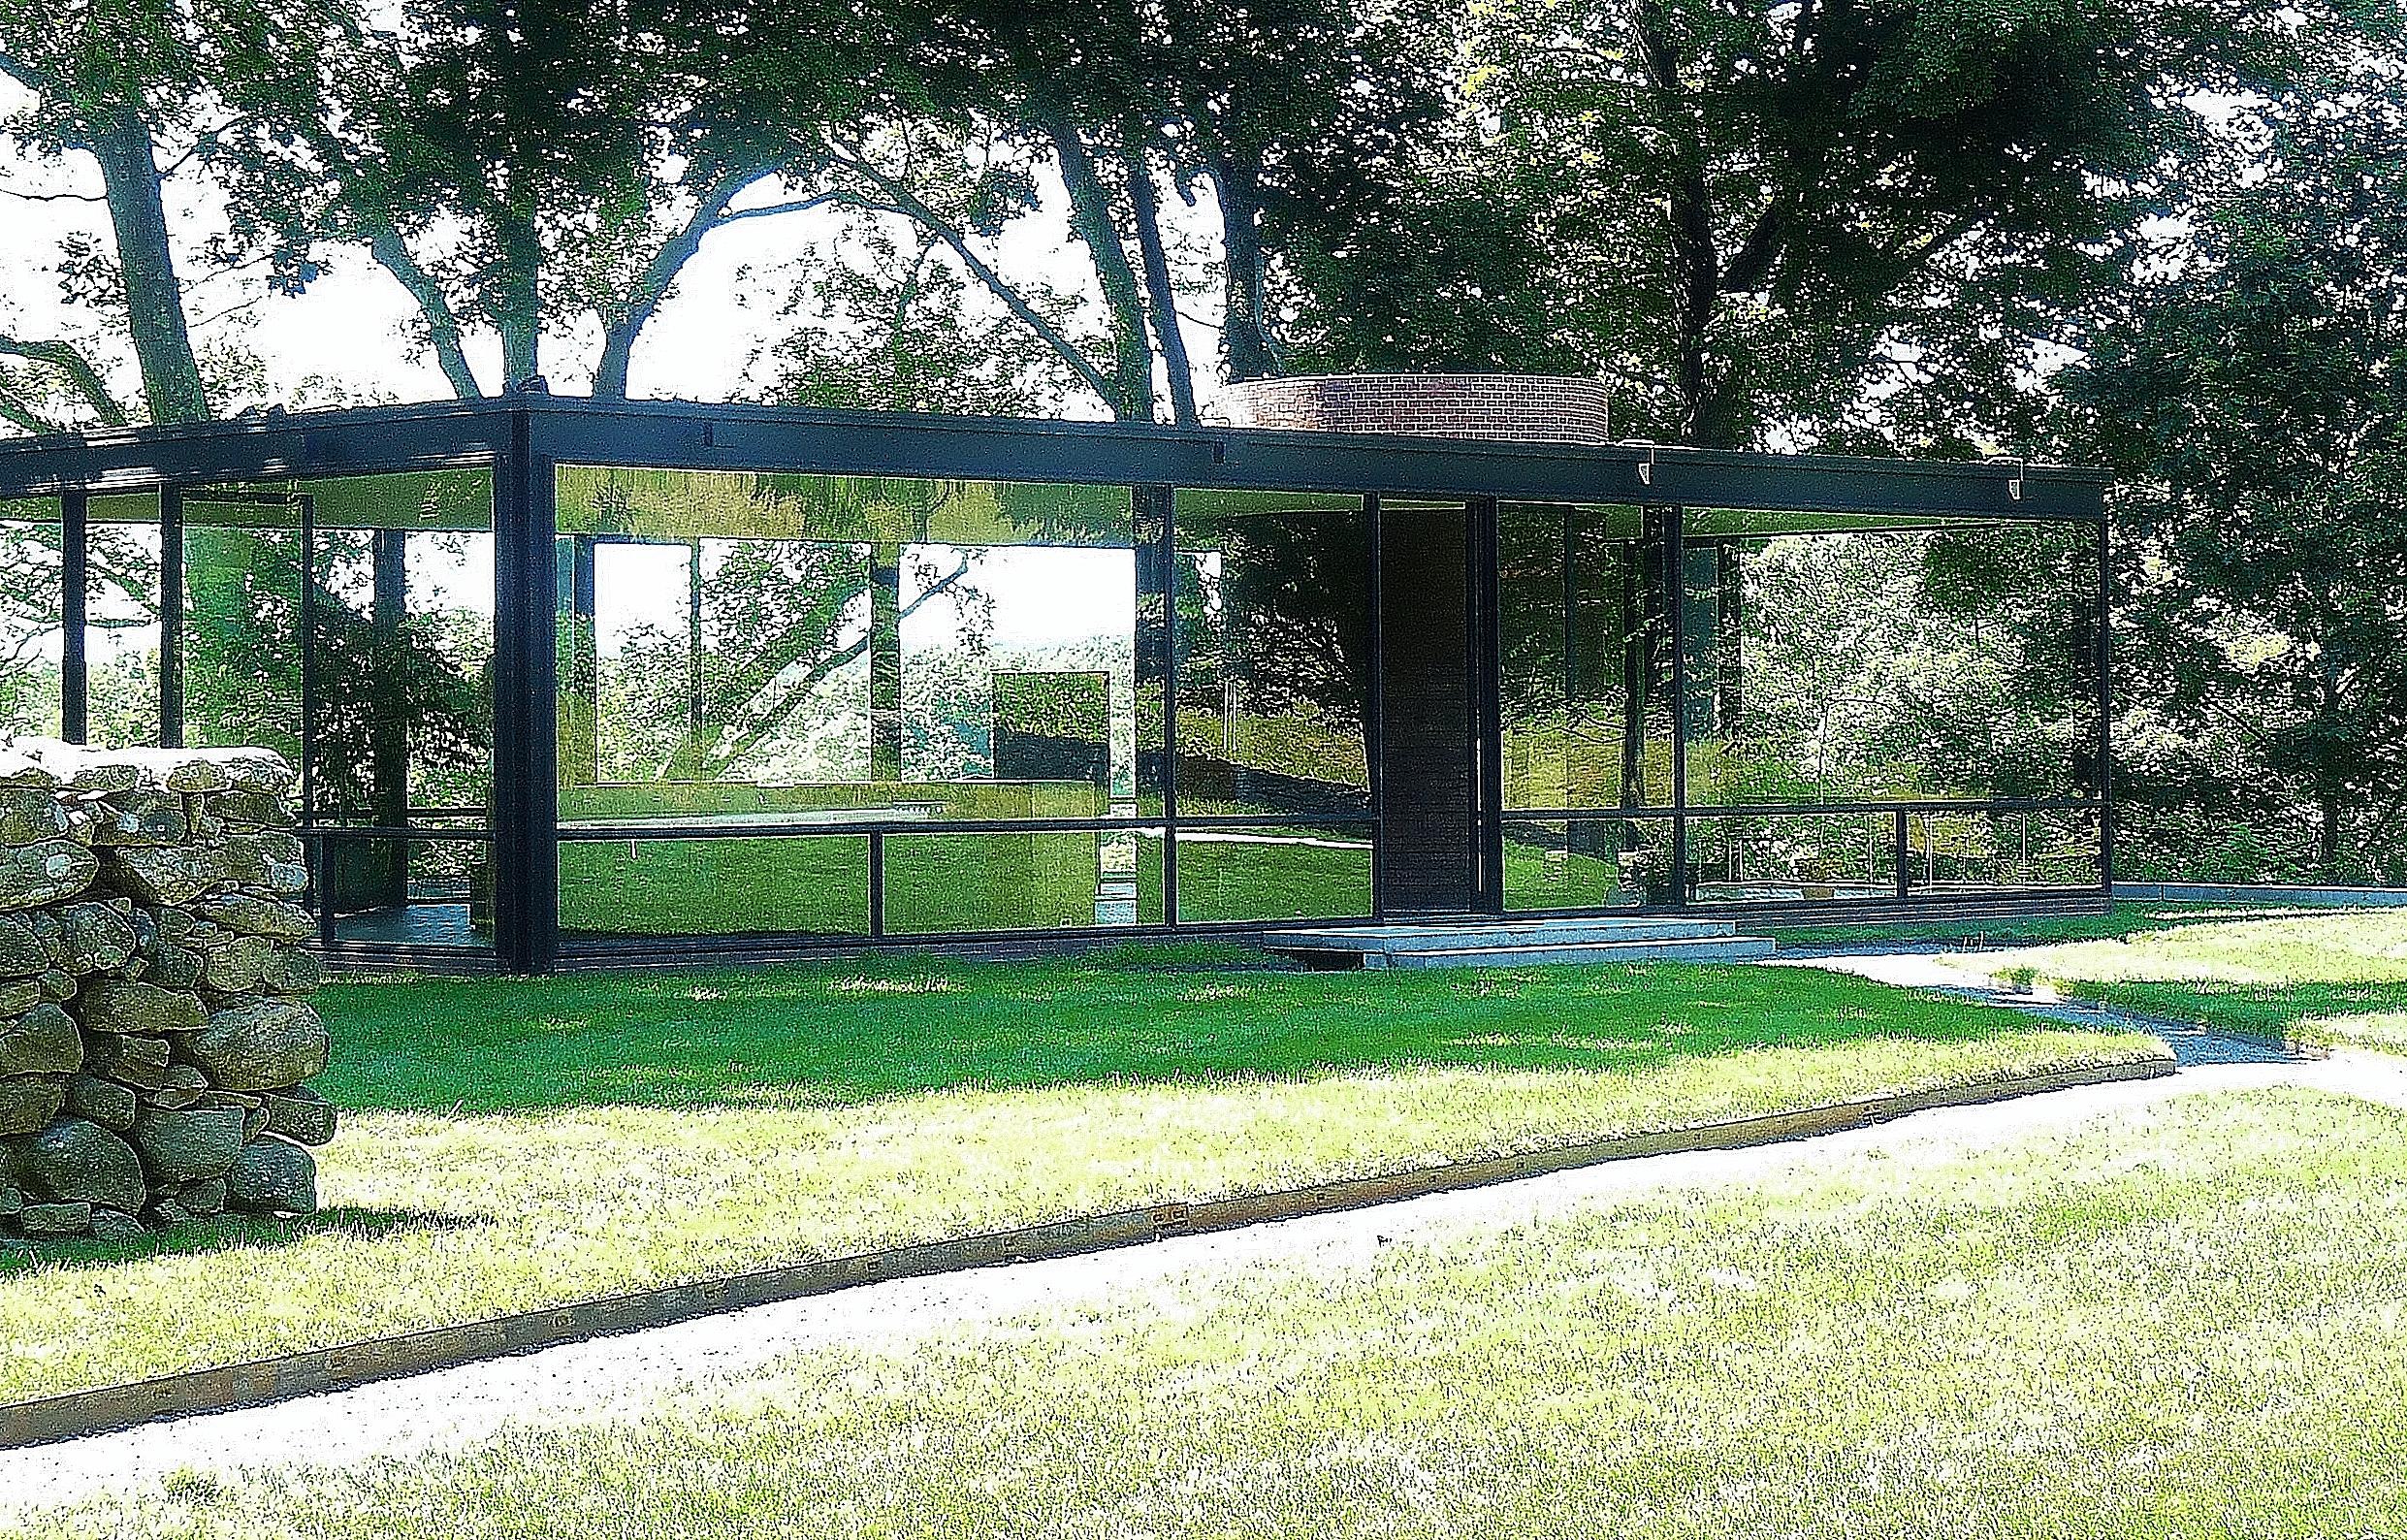 Philip Johnson Glass House file:philip johnson glass house the house - wikimedia